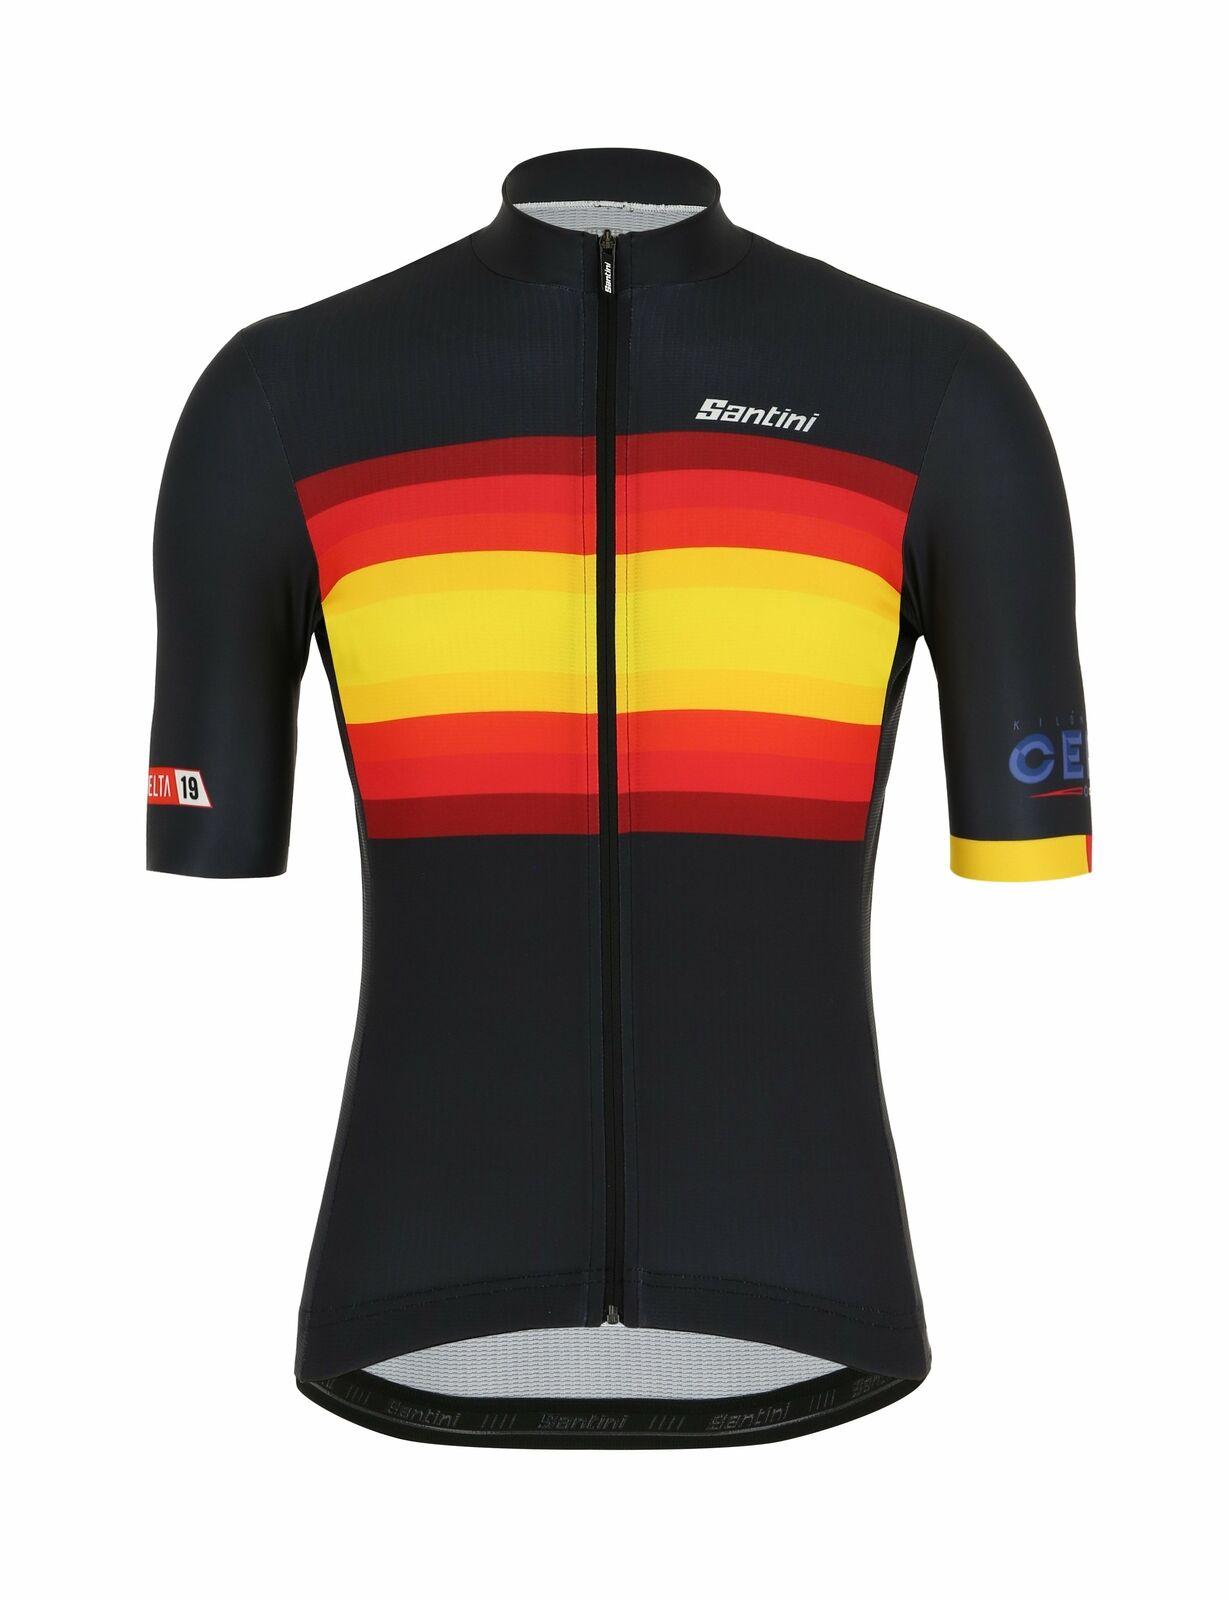 2019 La Vuelta Cero Radfahren Jersey by Santini